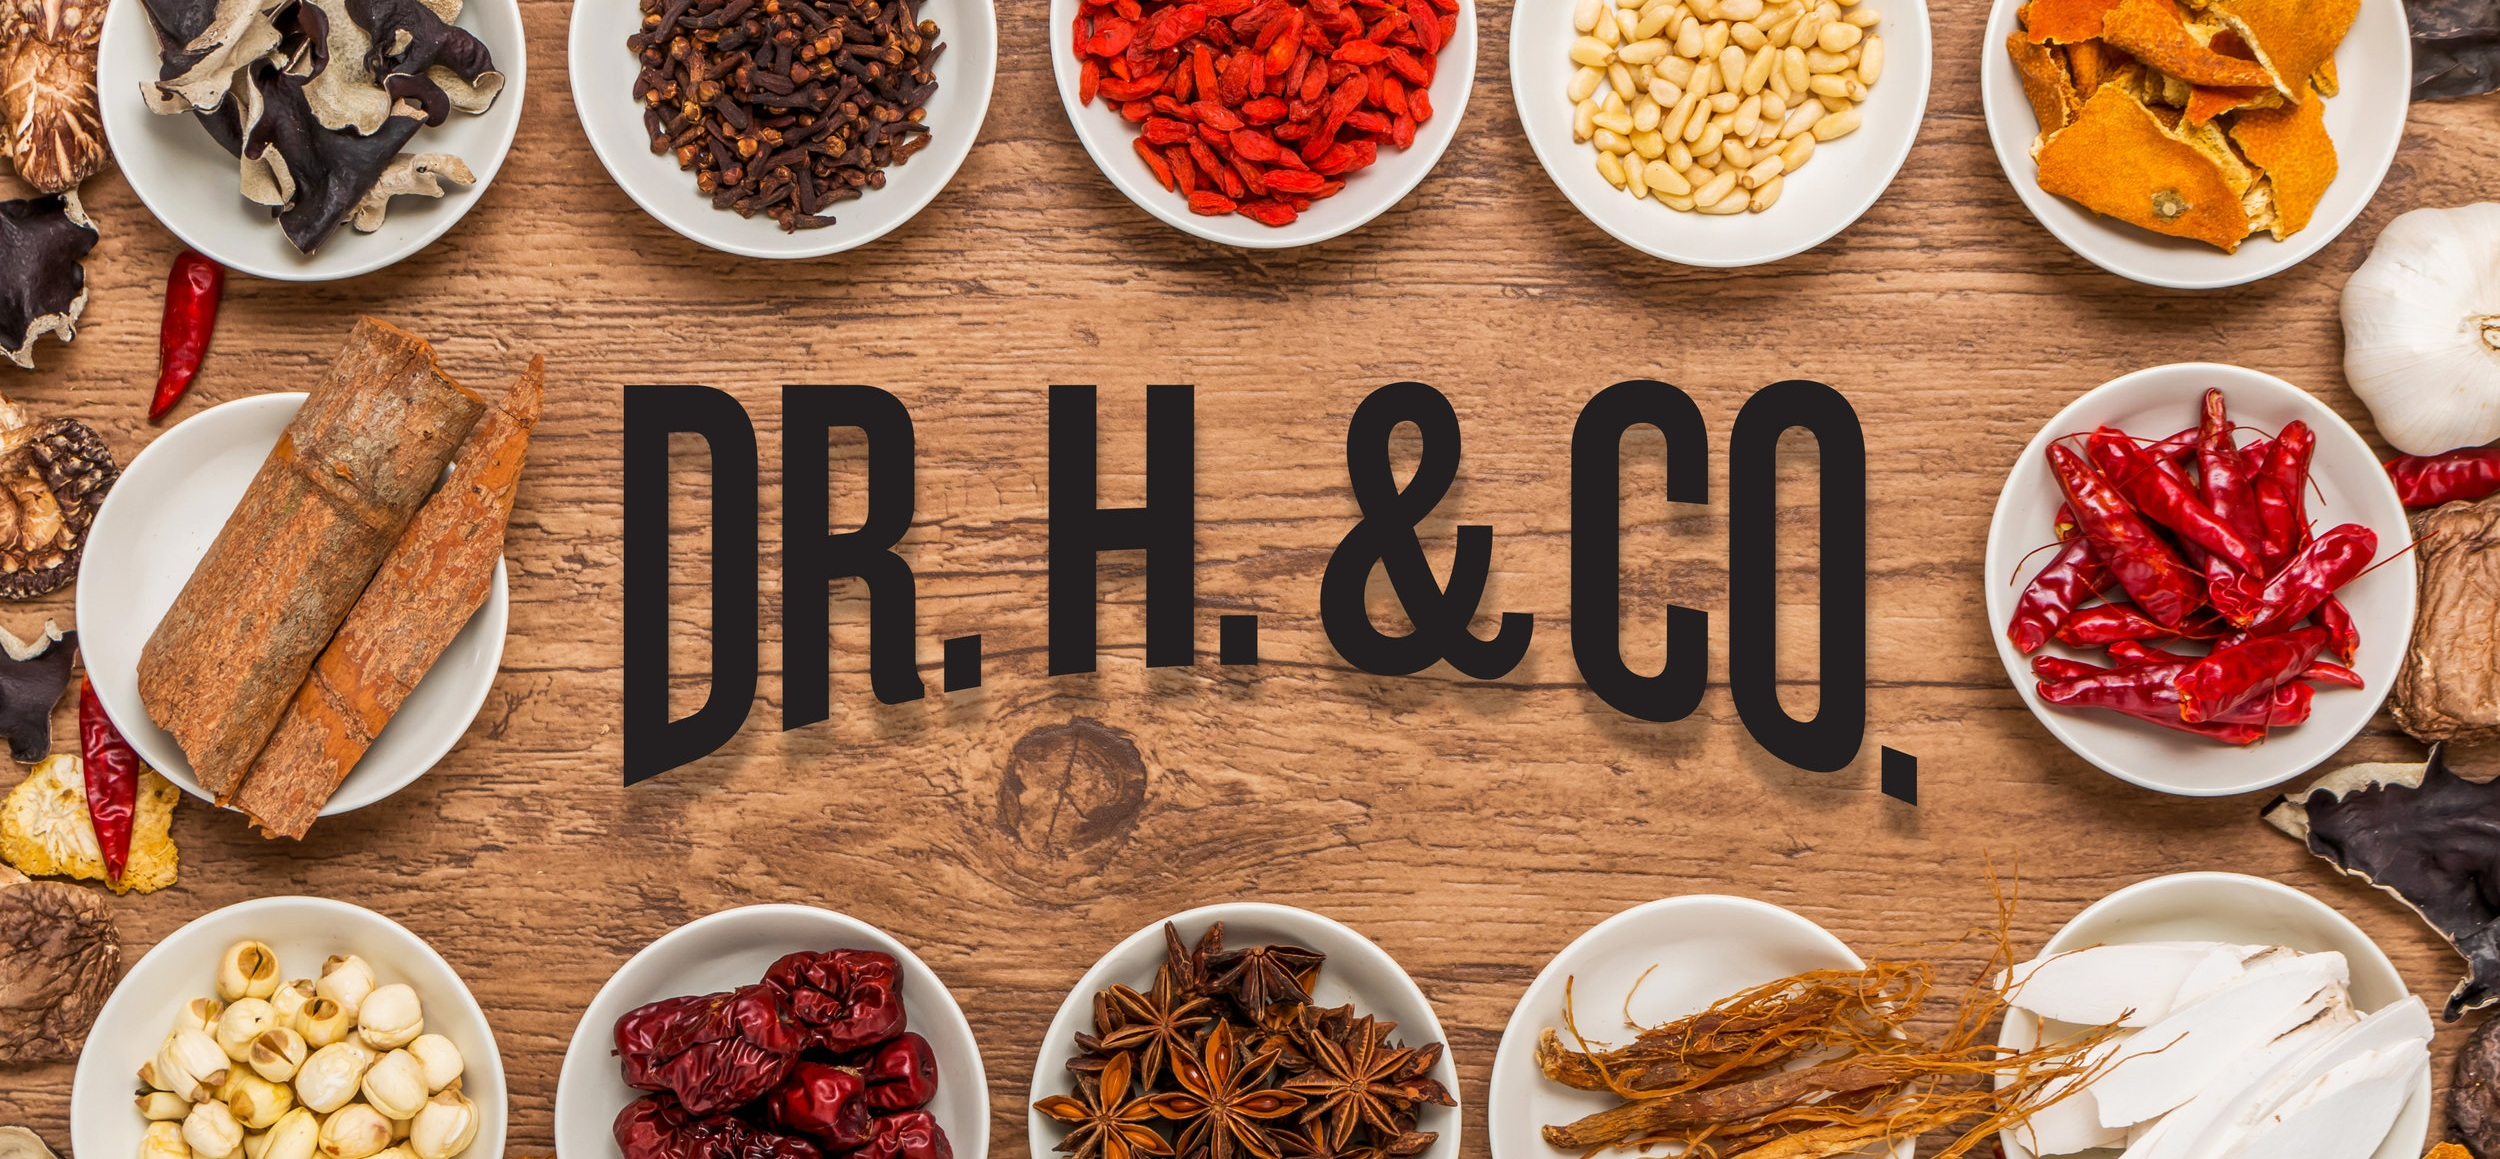 Dr. H. & Co. Heal Mouthwash